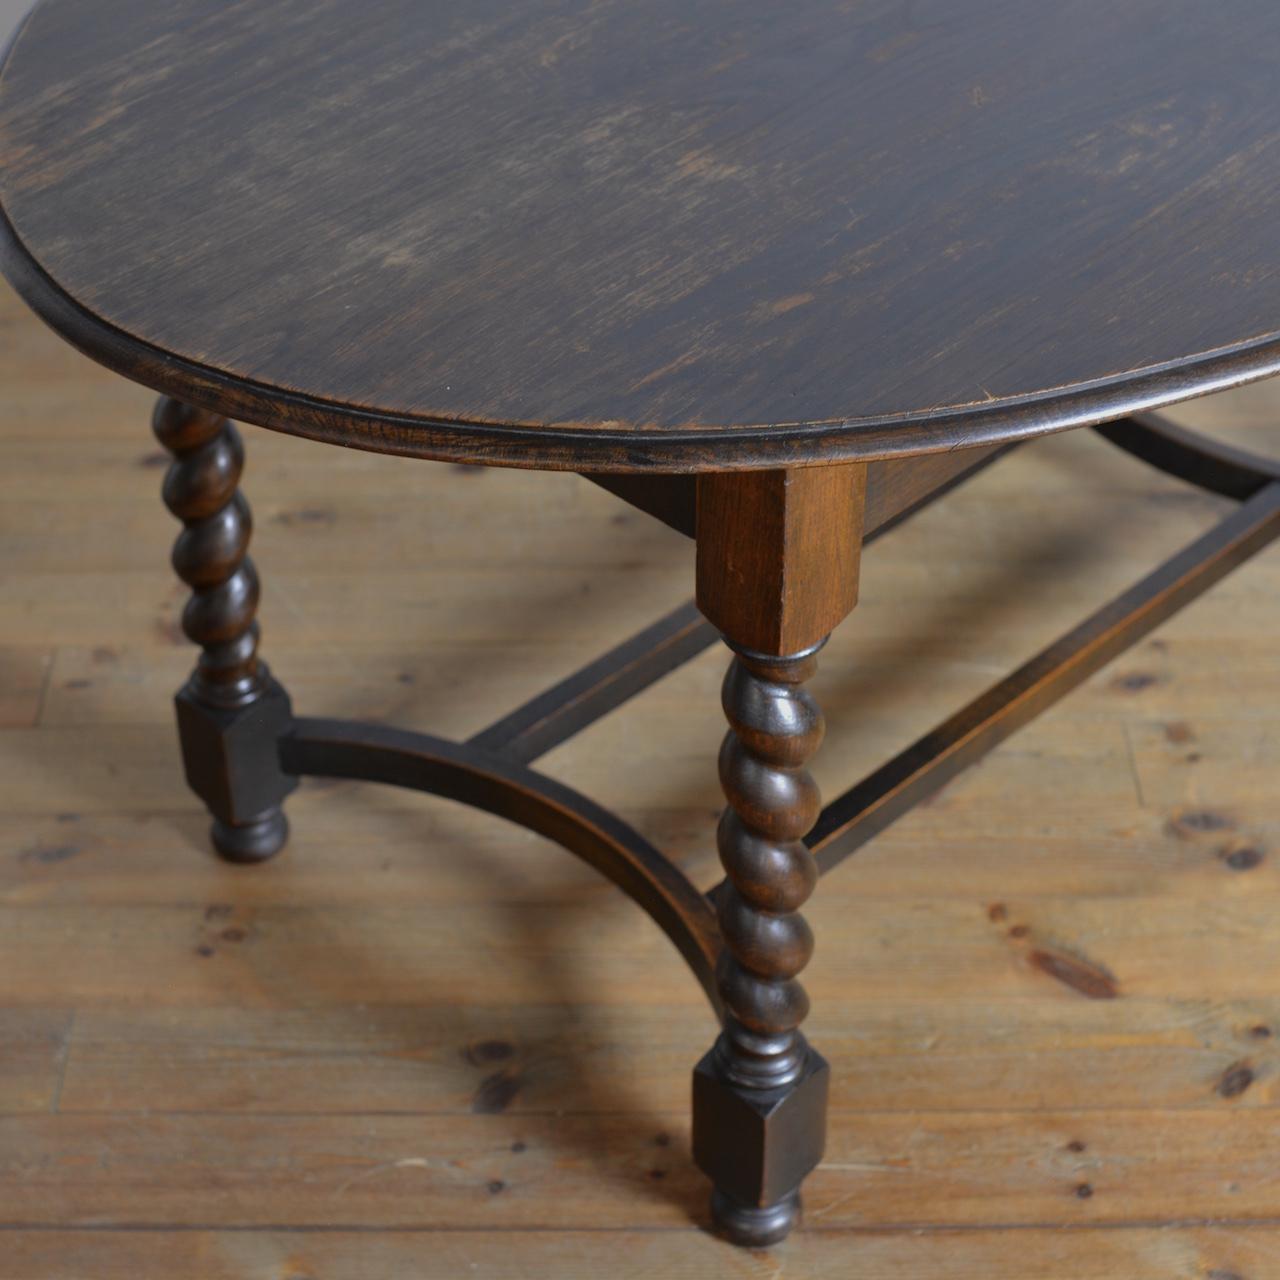 Dining Table  / ダイニングテーブル 〈オーバル テーブル・店舗什器〉